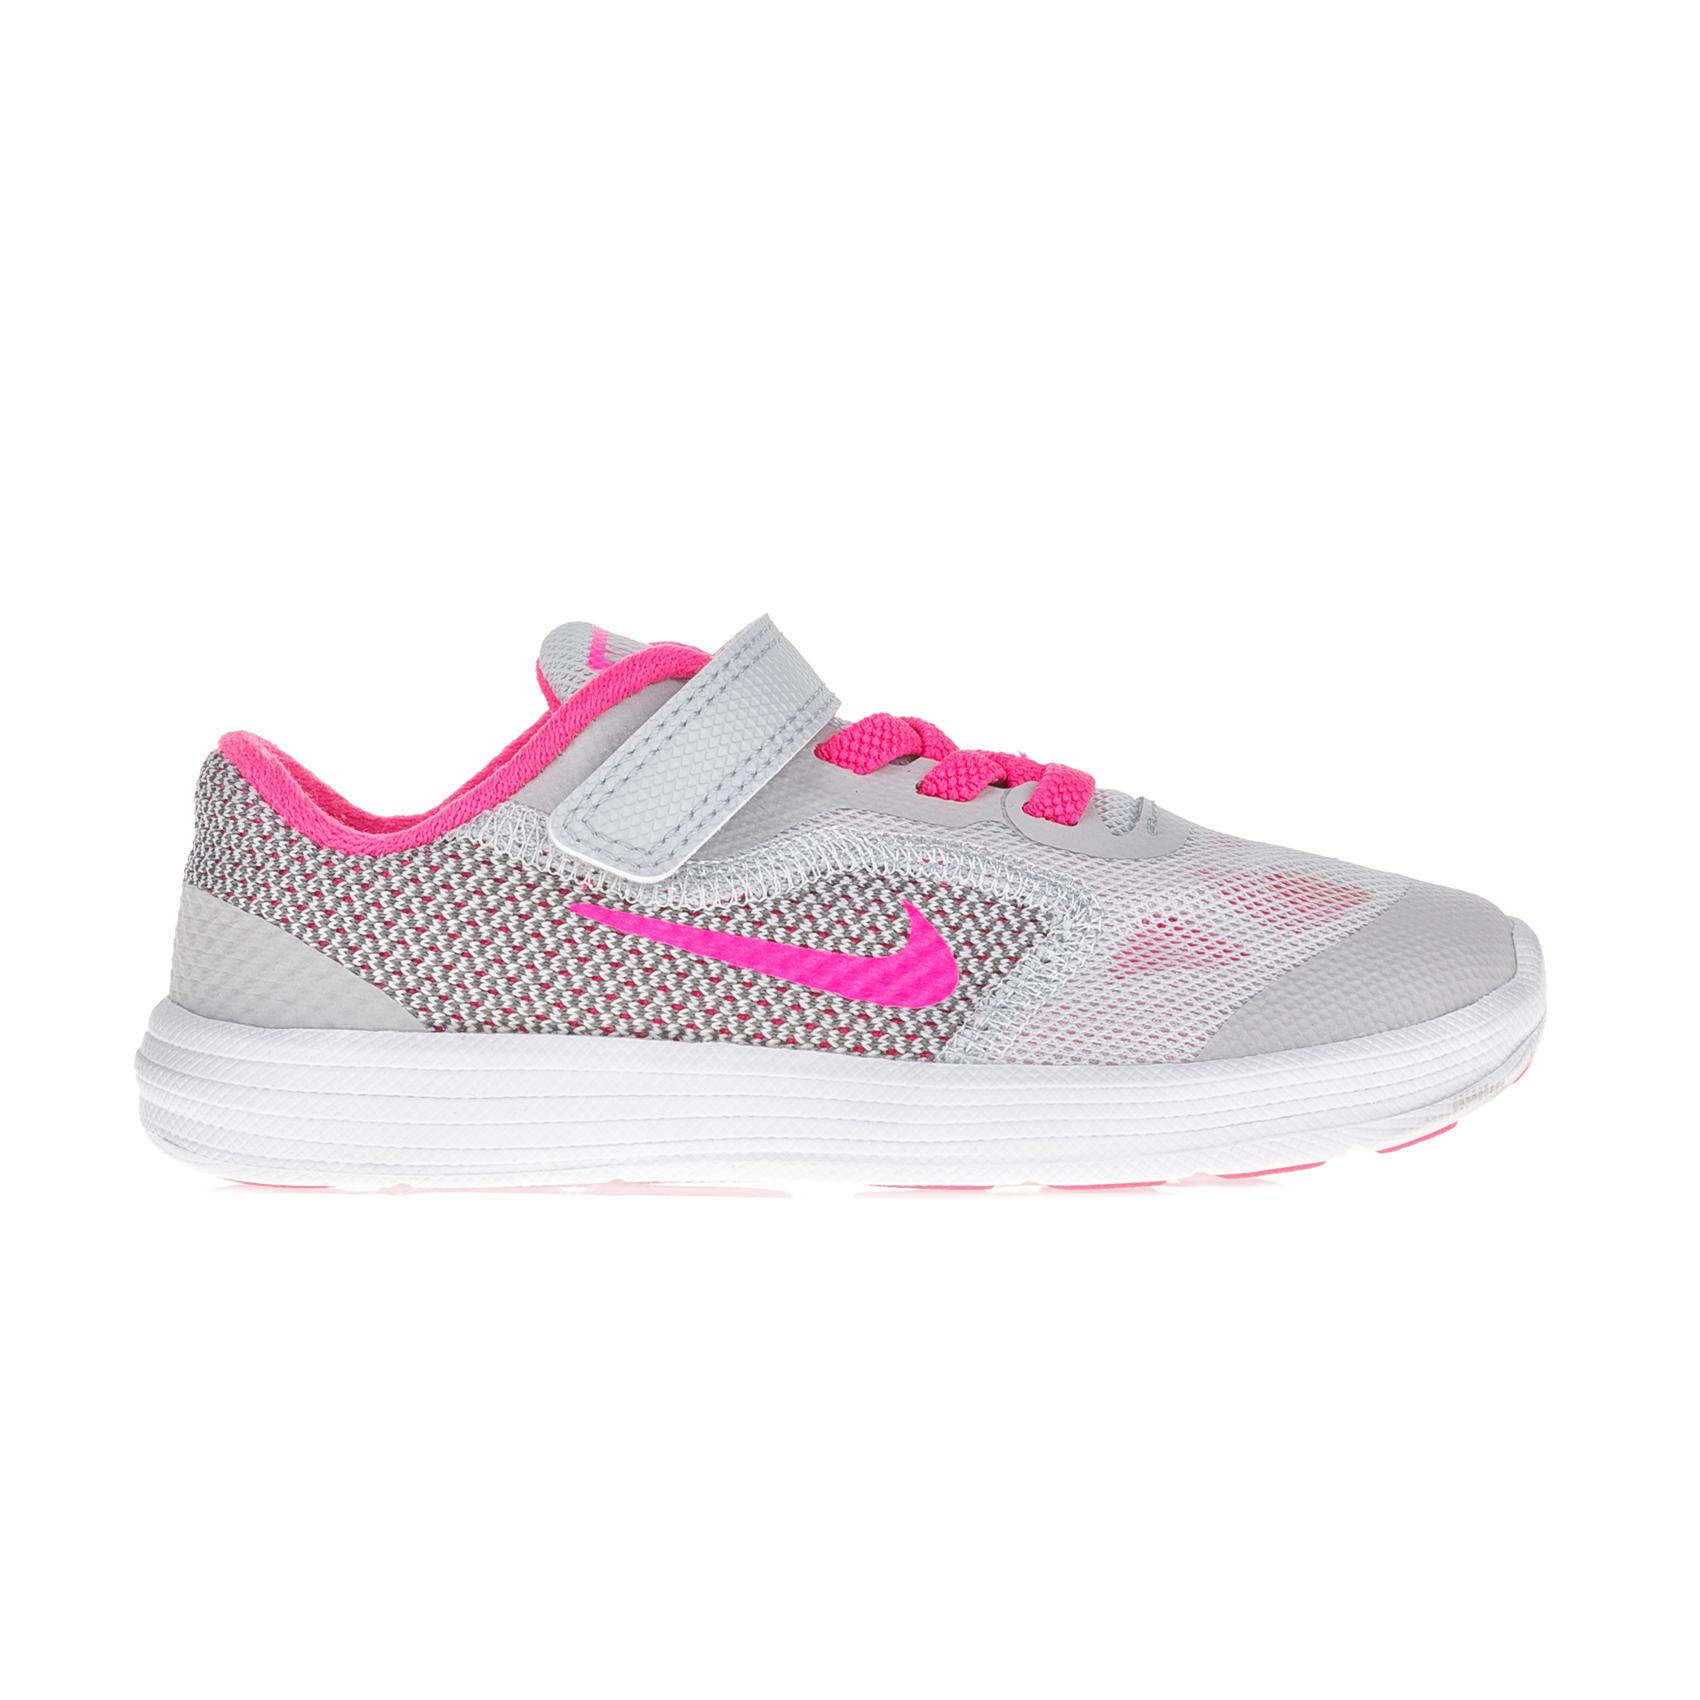 NIKE – Βρεφικά αθλητικά παπούτσια Nike REVOLUTION 3 (TDV) λευκά – ροζ